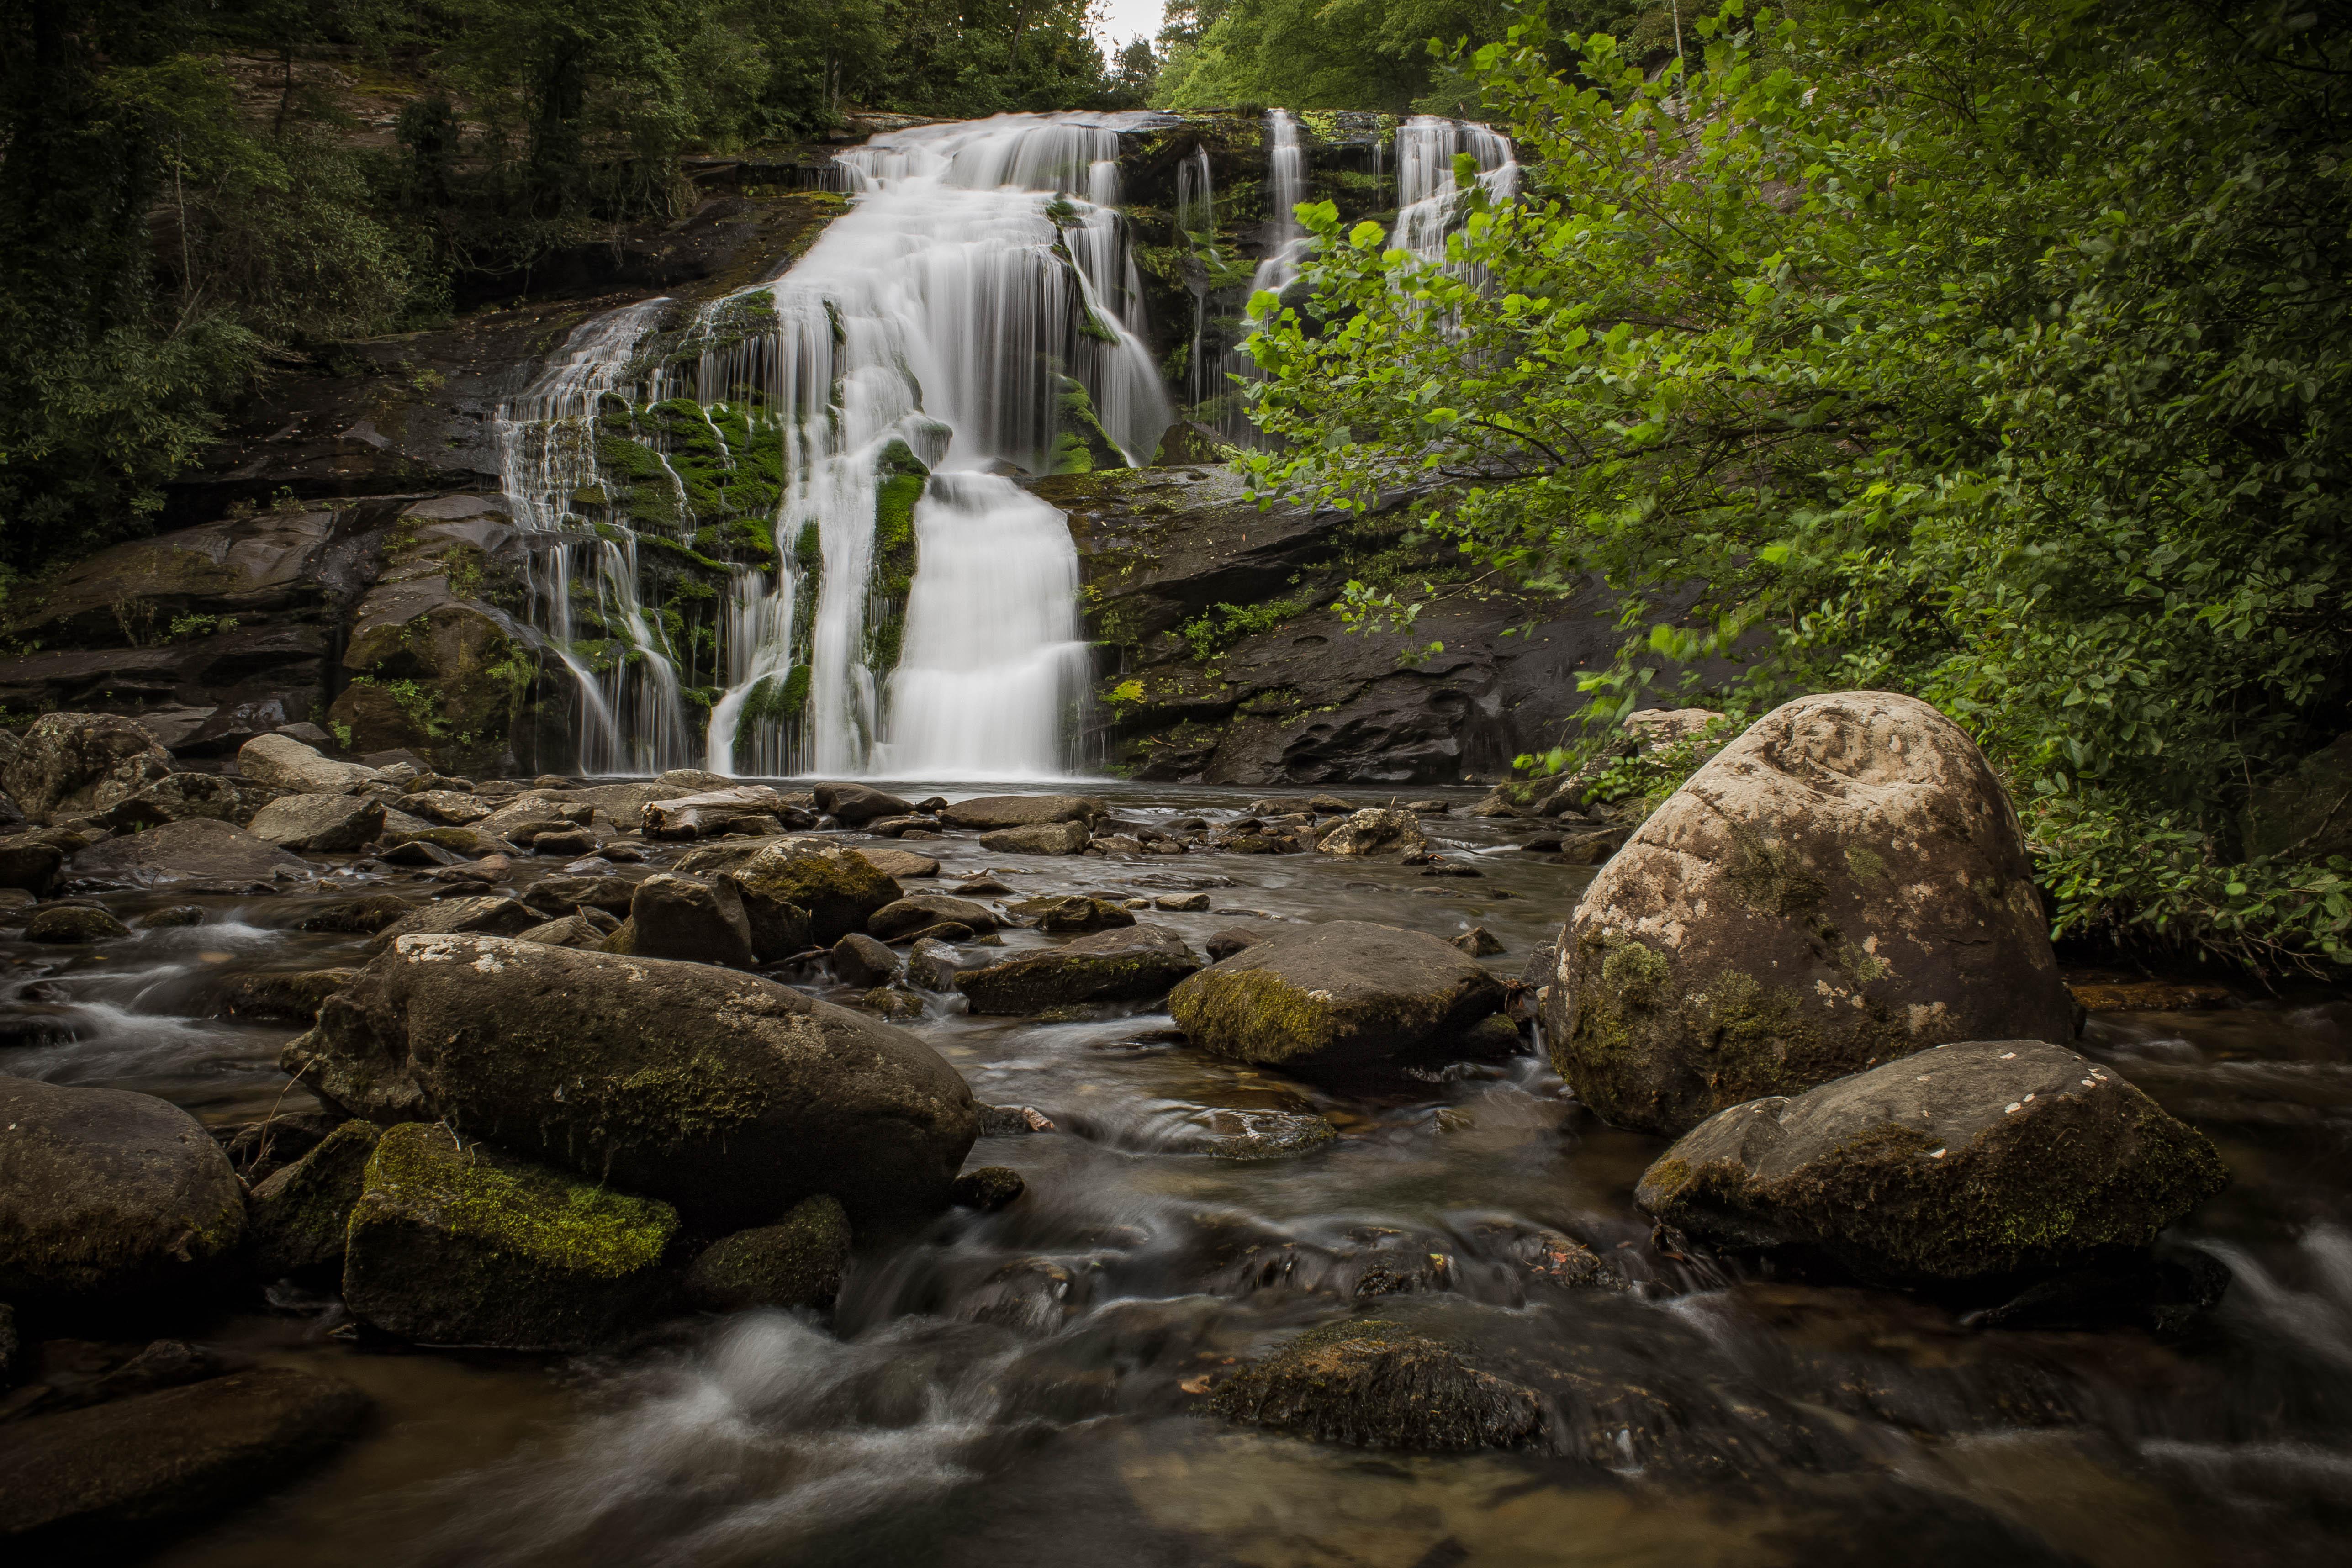 Bald River Falls near Tellico Plains, TN